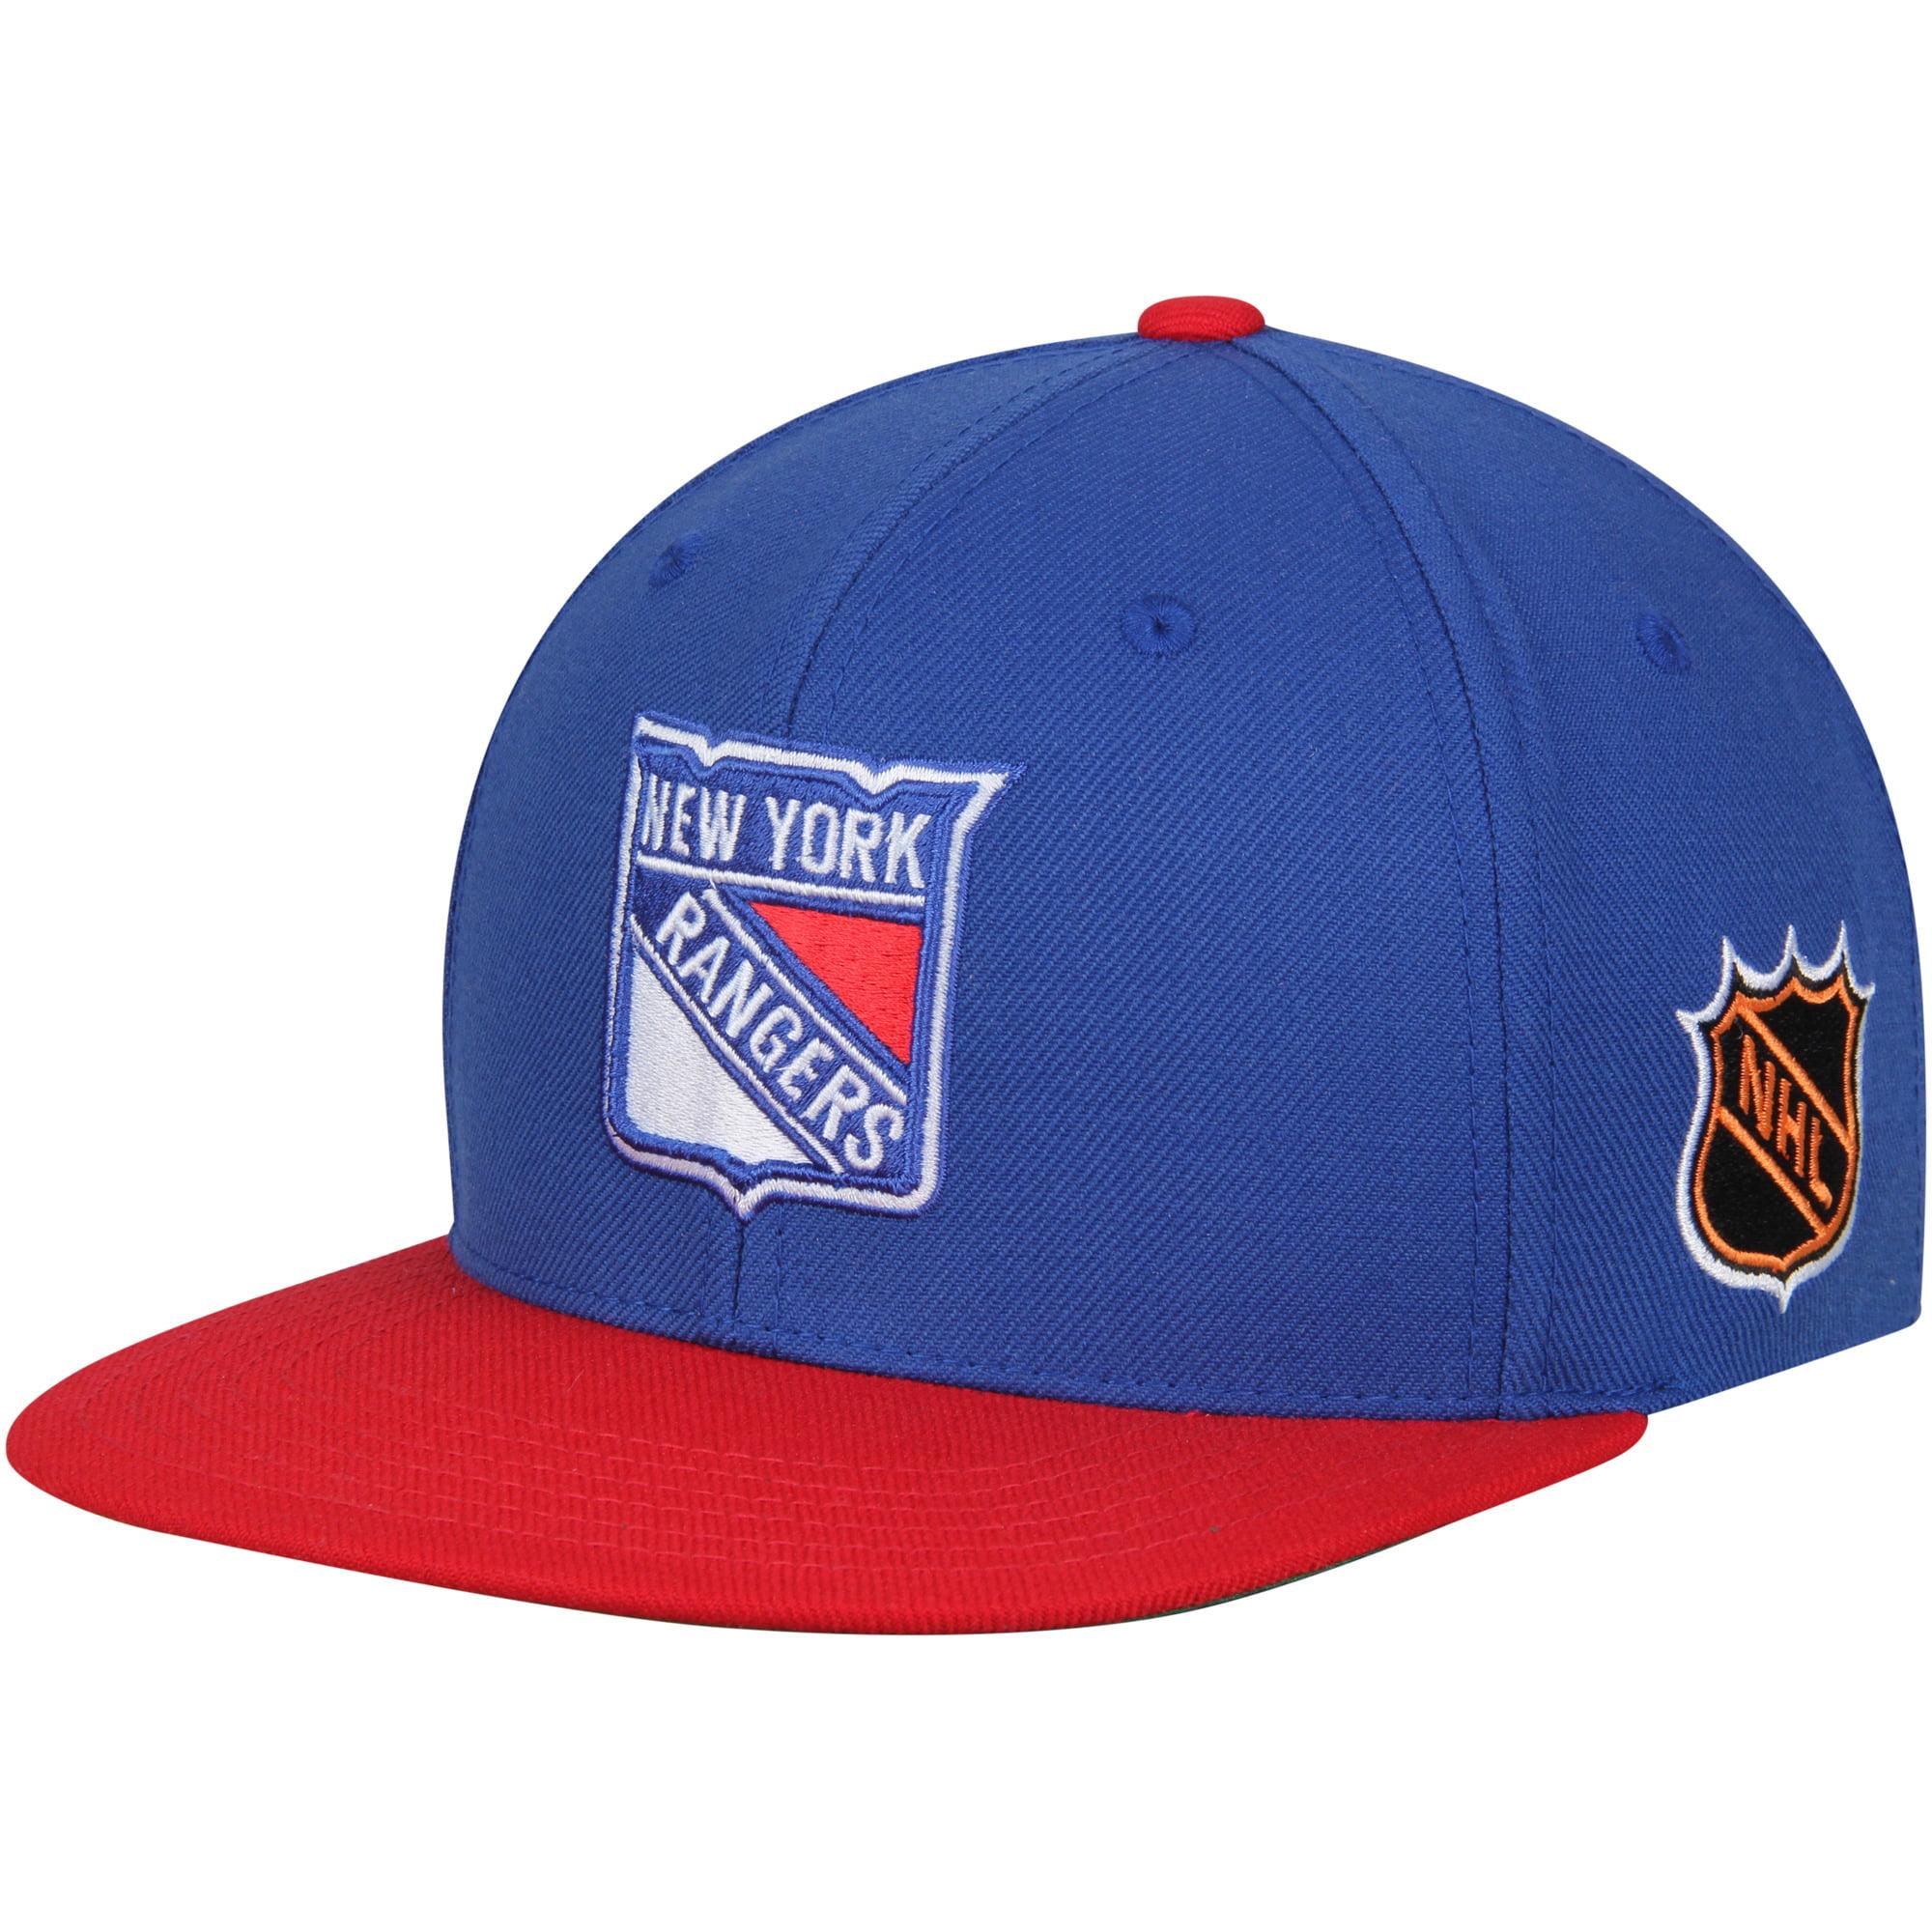 New York Rangers American Needle Blockhead Snapback Adjustable Hat - Blue/Red - OSFA